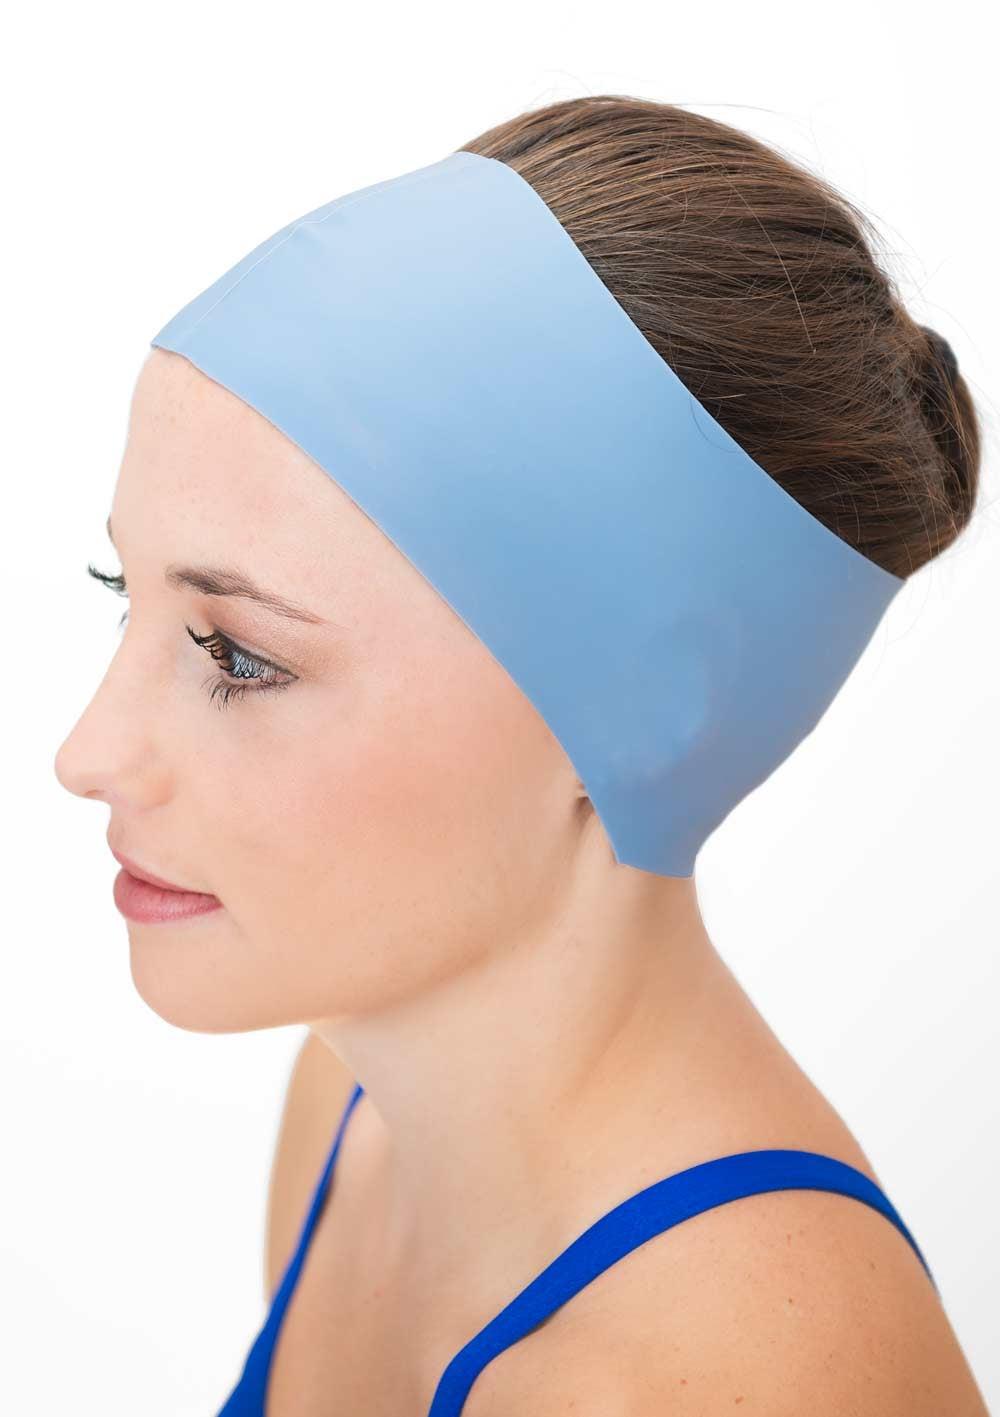 Astounding Waterproof Swim Cap Hair Guard Headband Headcovers Short Hairstyles For Black Women Fulllsitofus